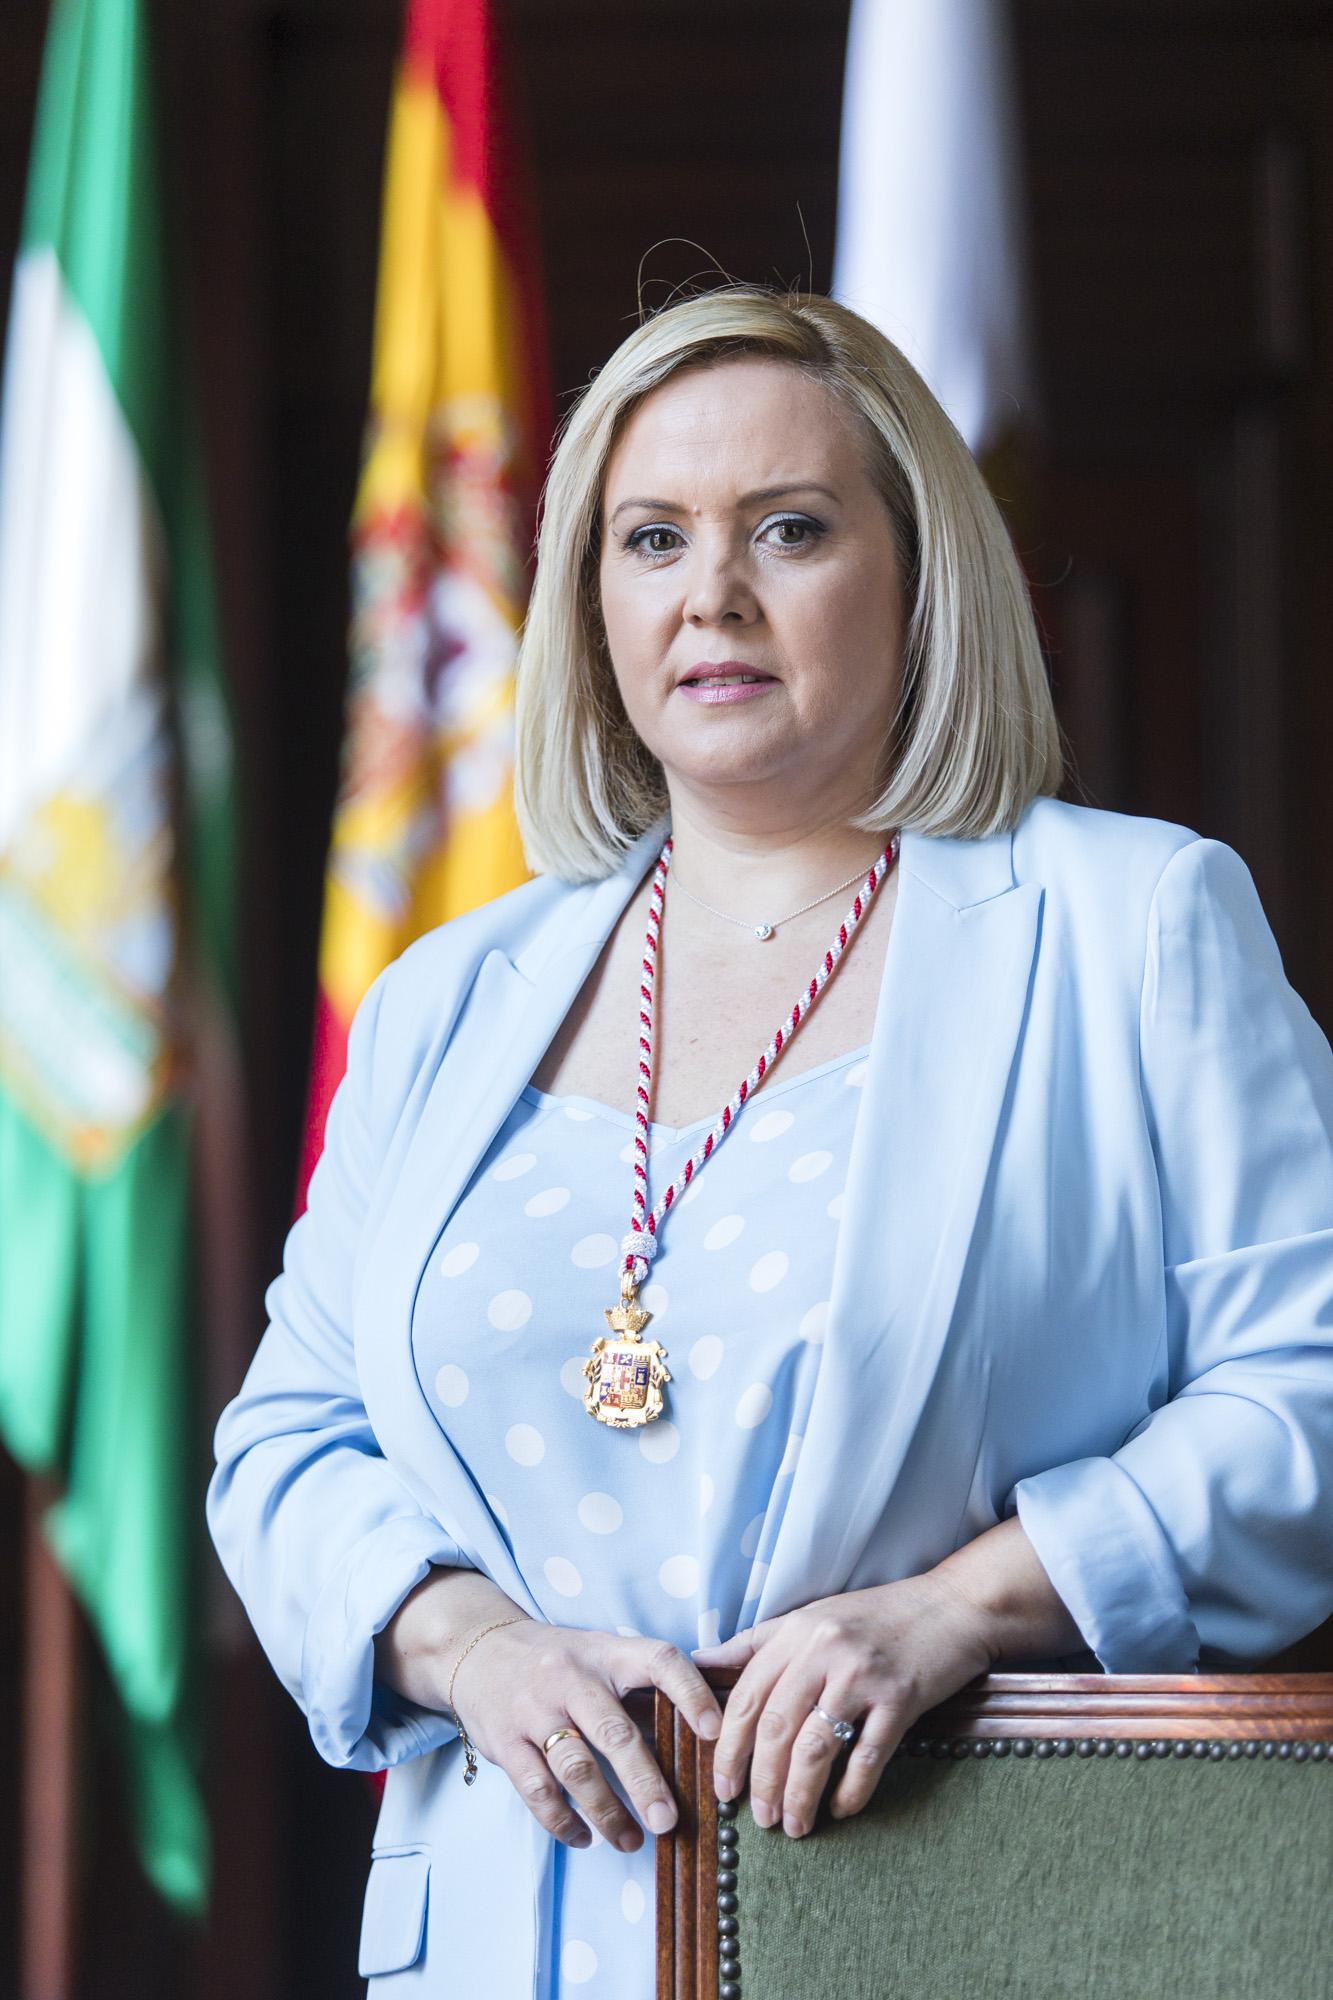 Yolanda Lozano Salinas